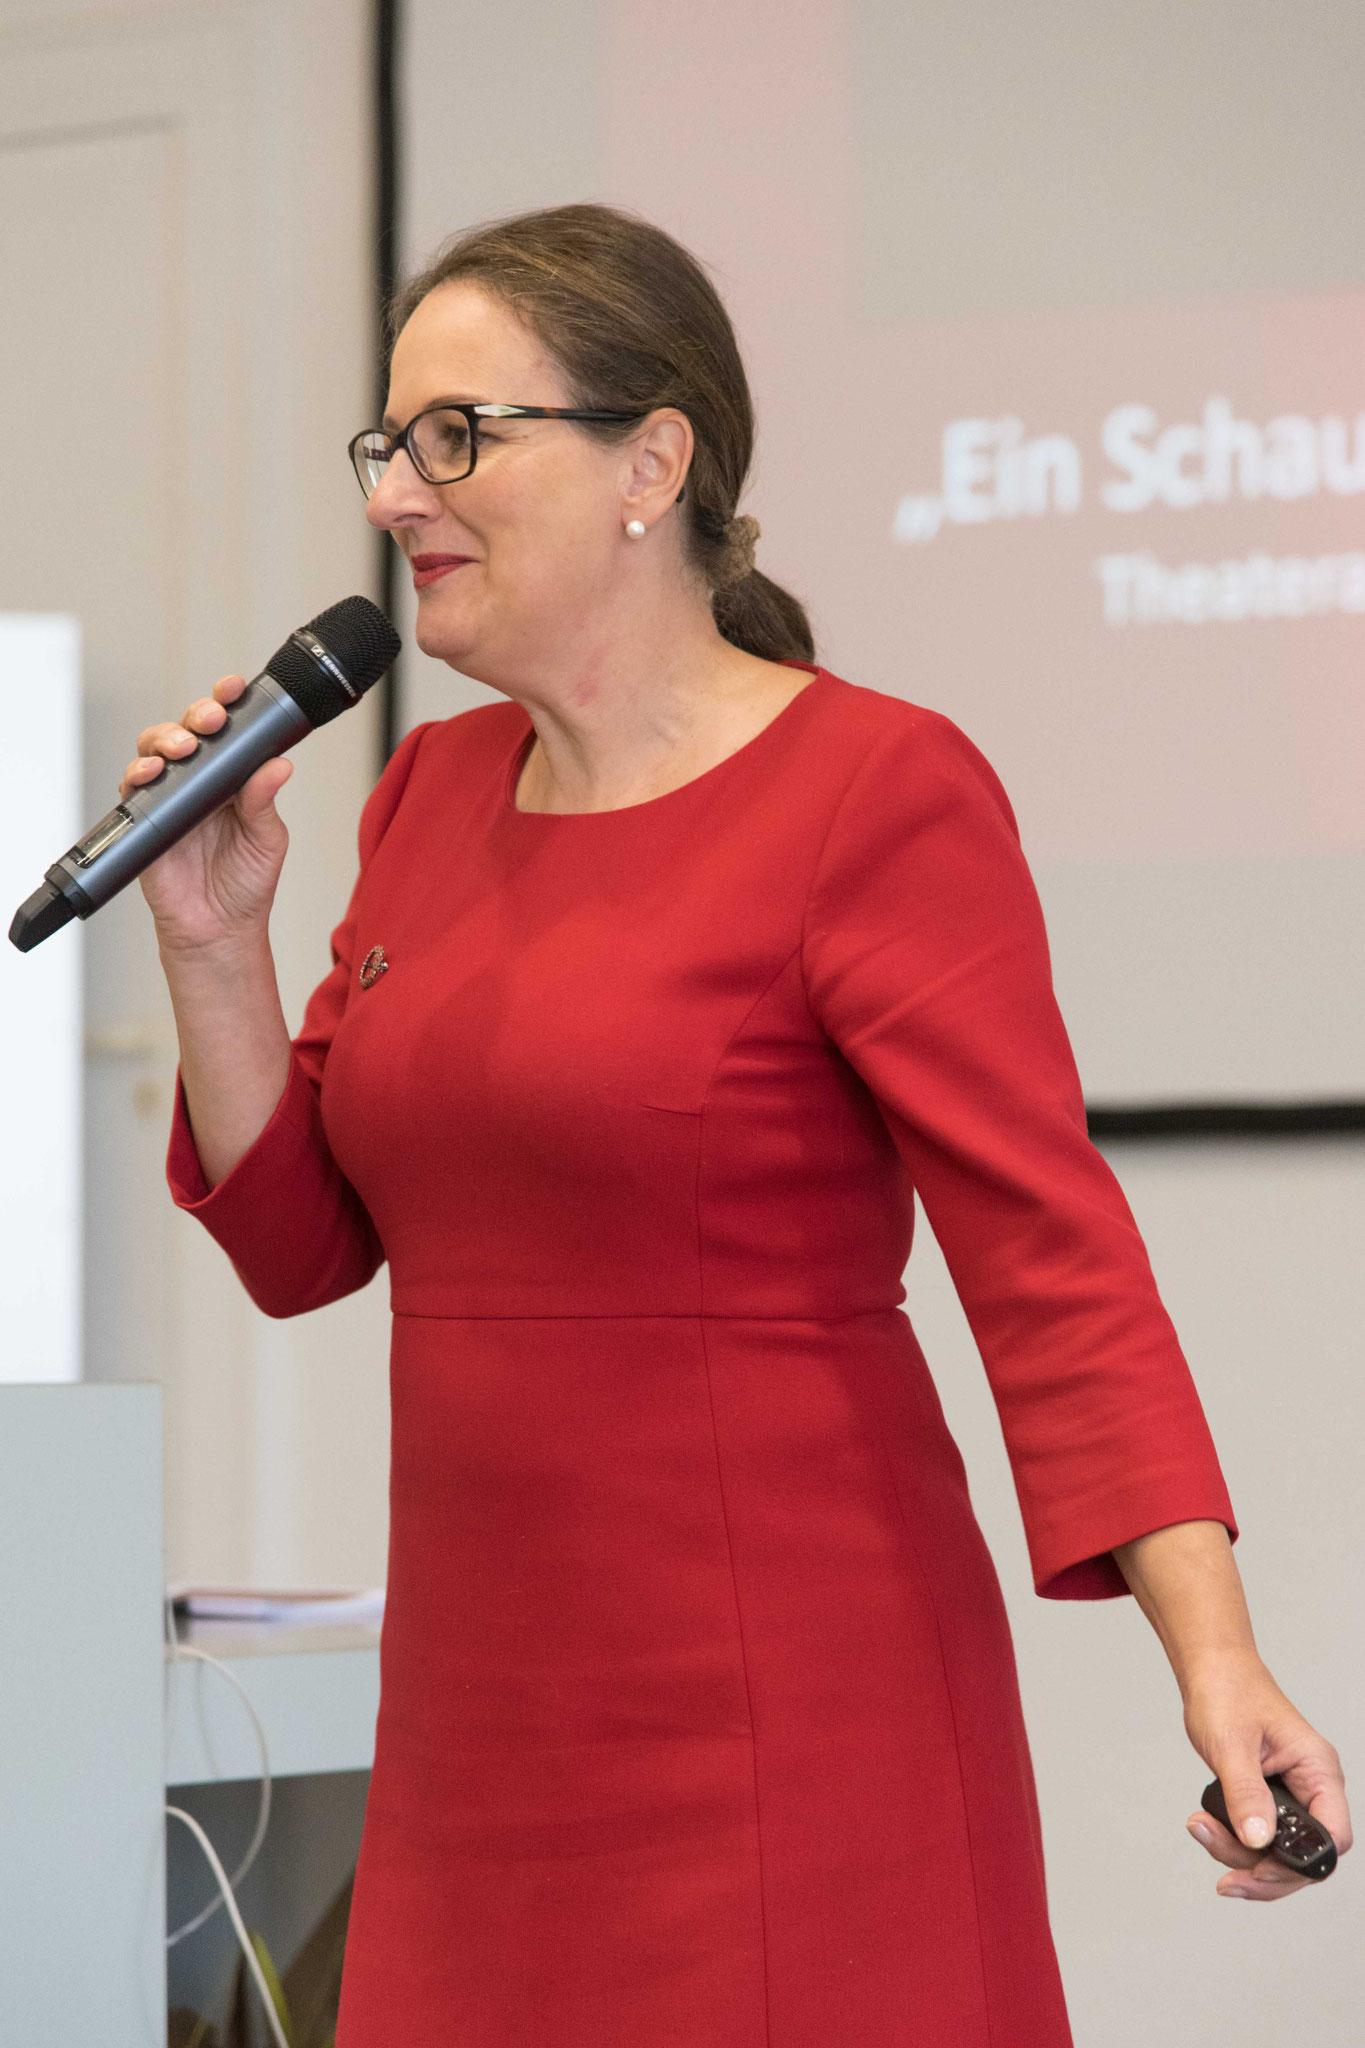 Regisseurin Silvia Kirchhof